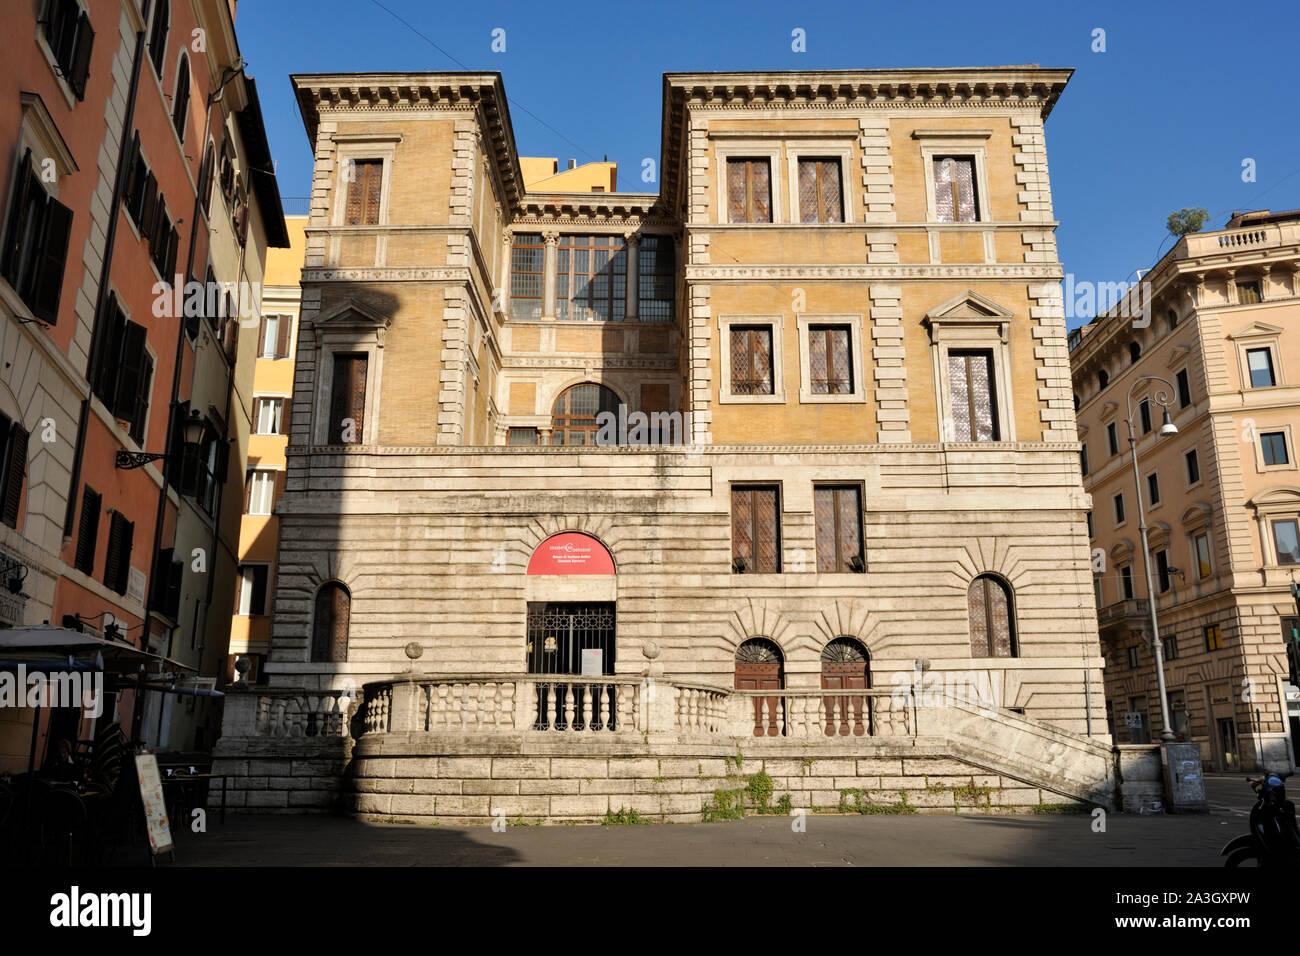 Italien, Rom, Museo barracco, Piccola farnesina Stockfoto